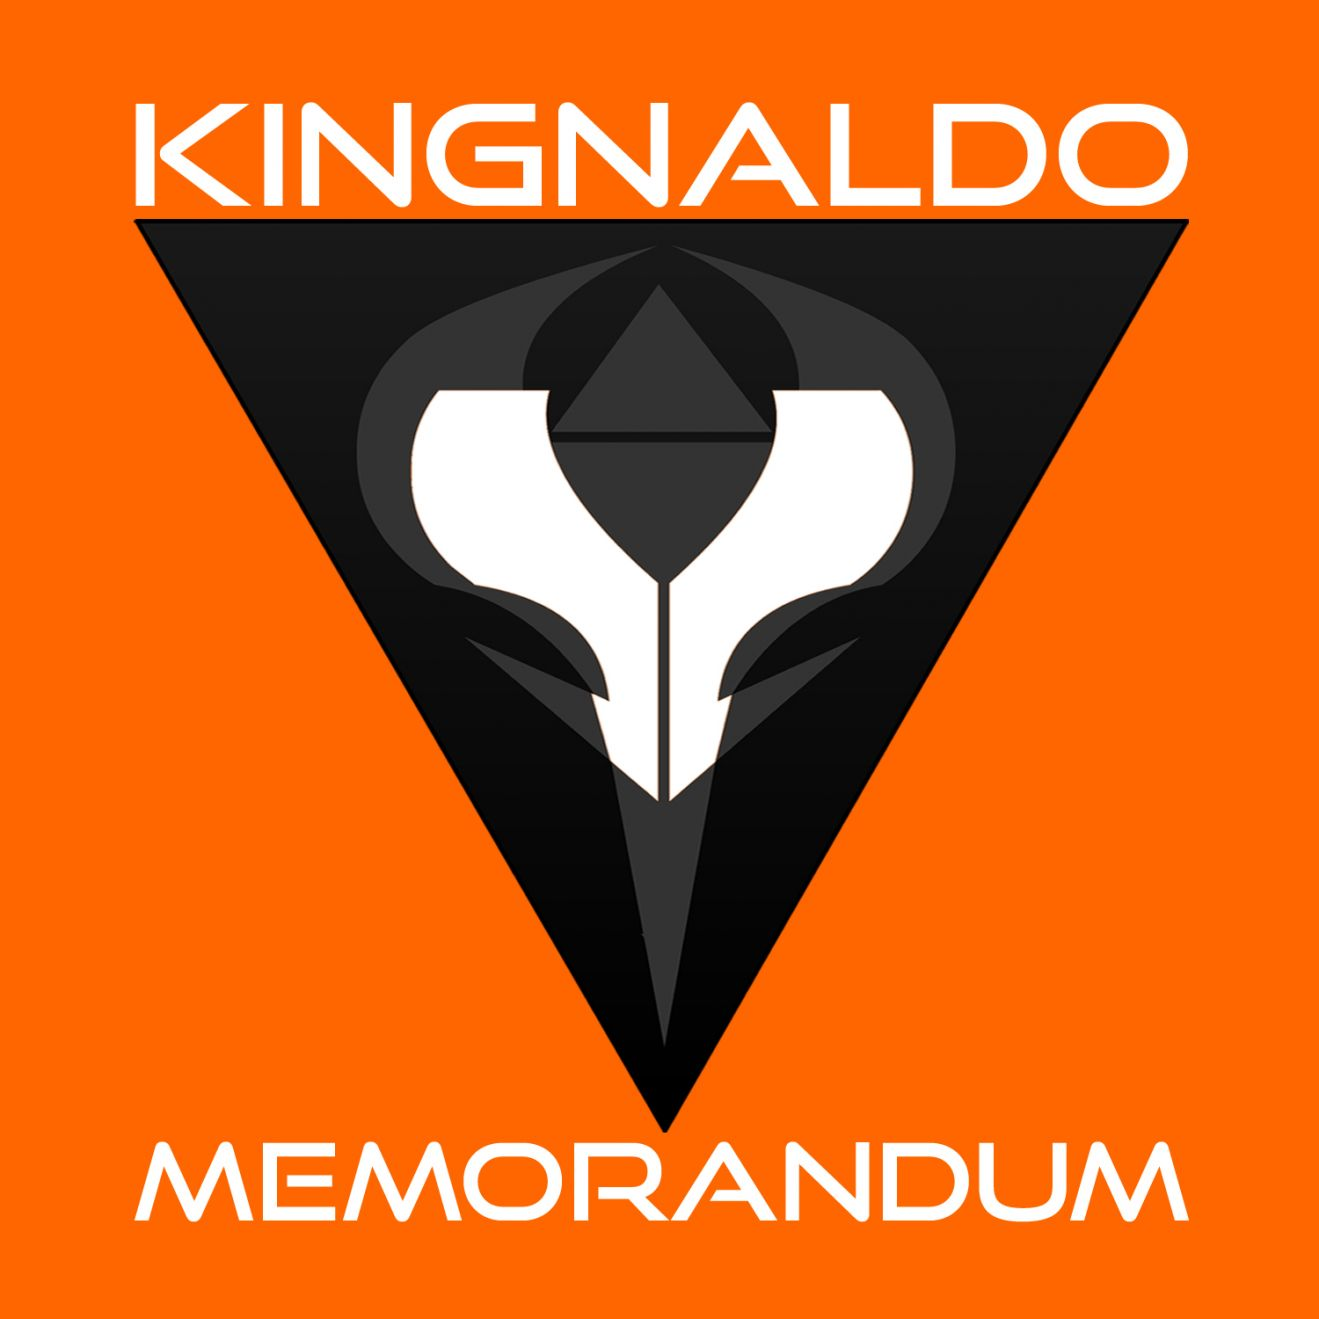 Kingnaldo_Memorandum_Cover